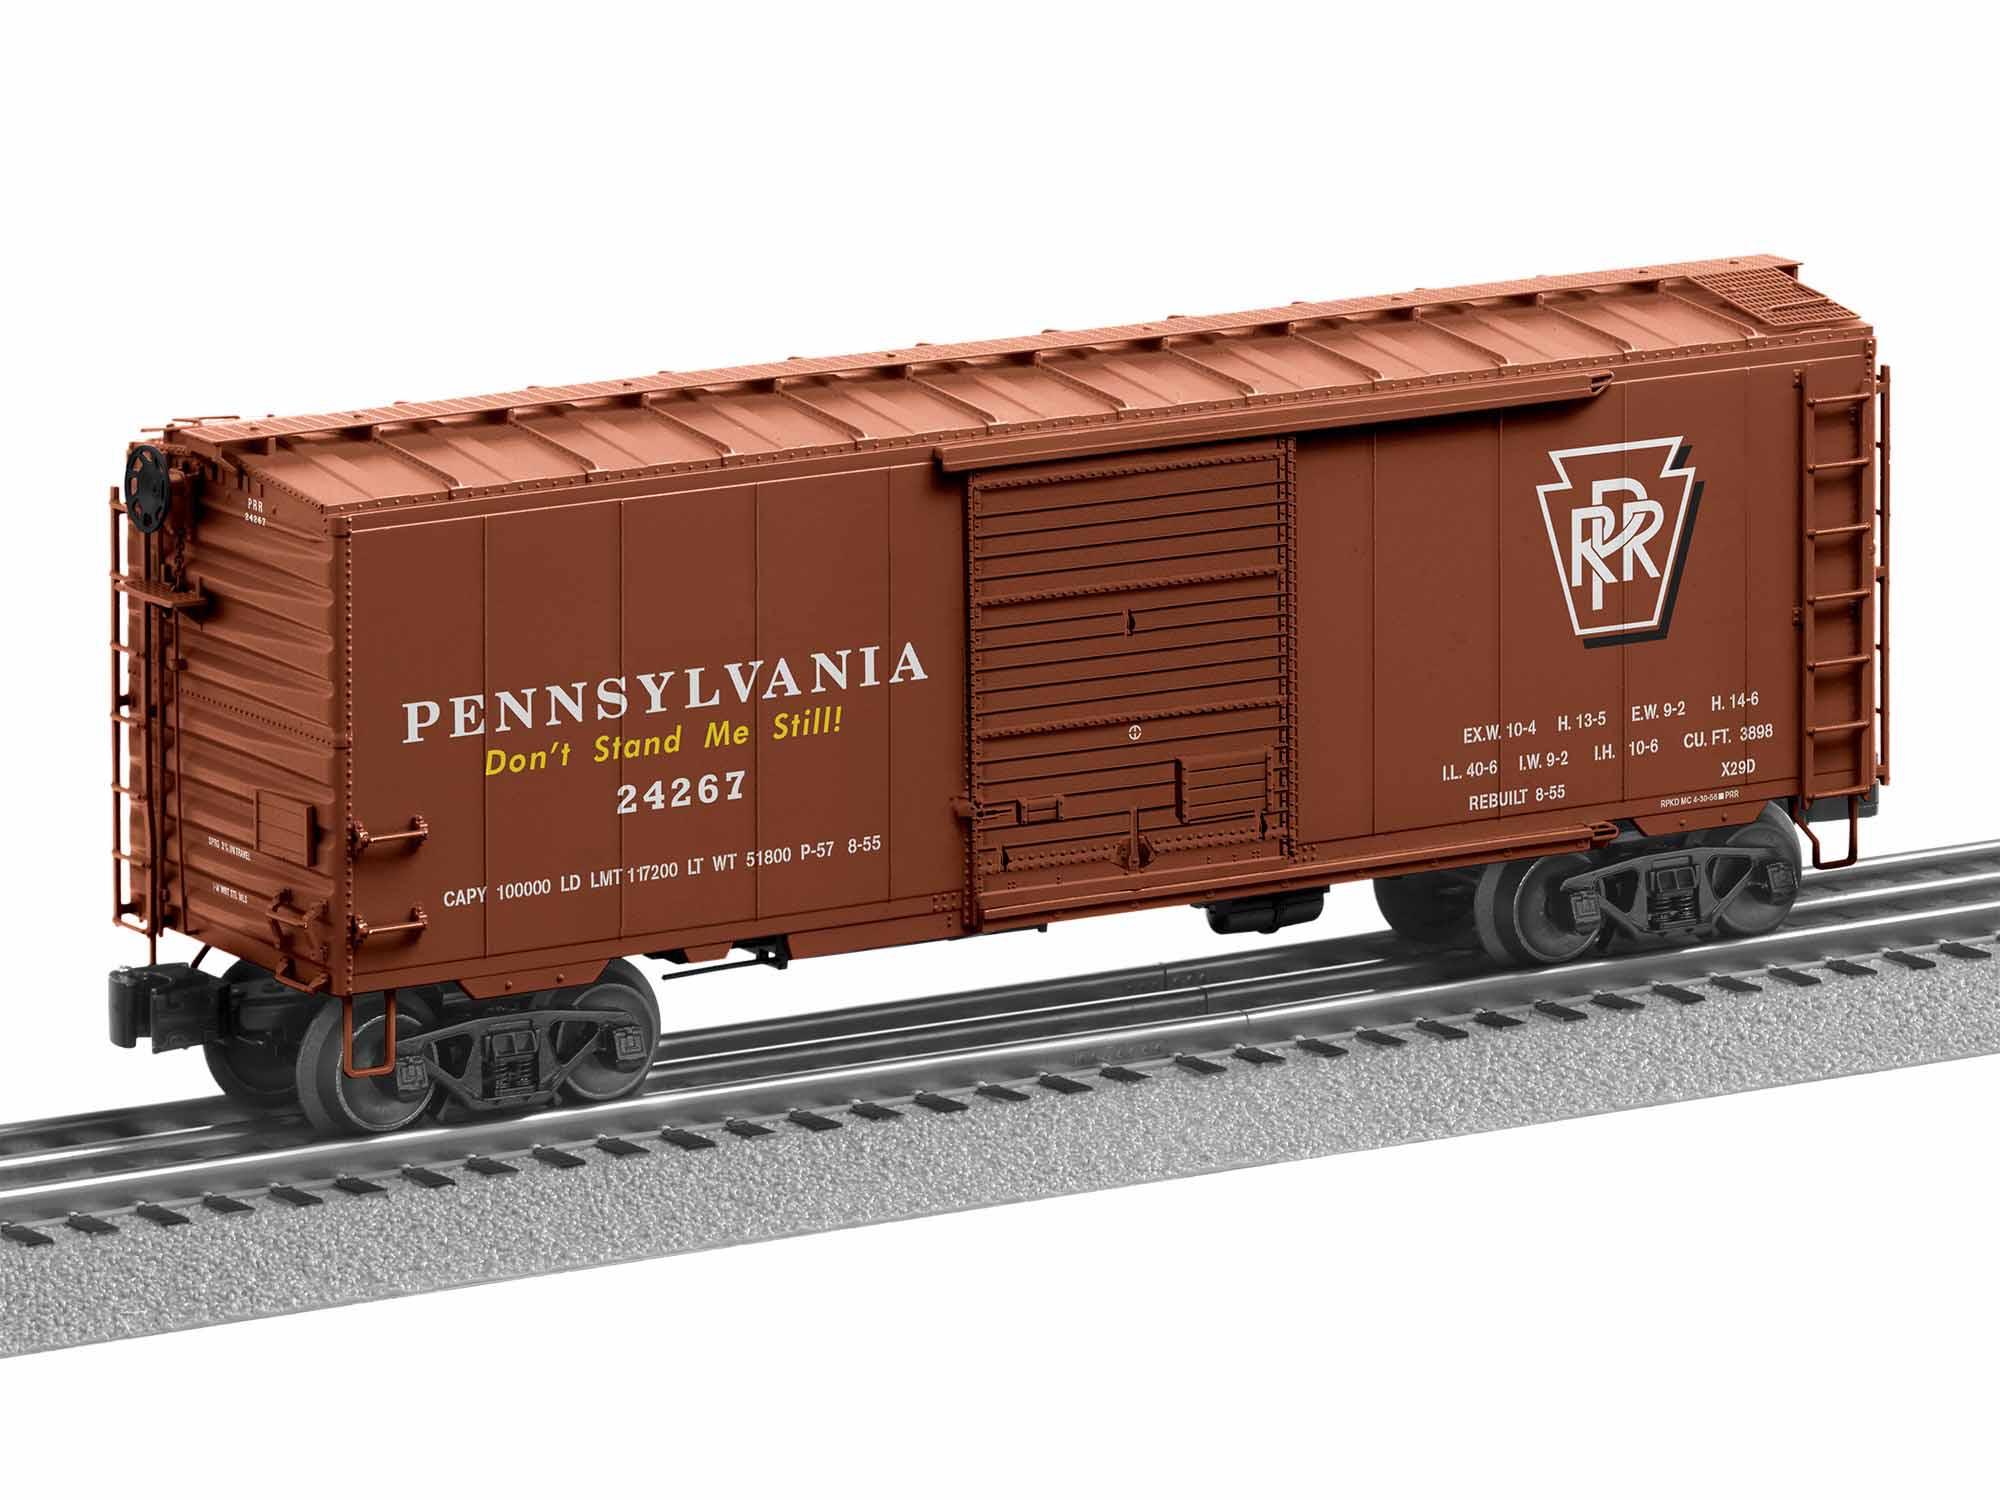 LNL1926640 Lionel O PS-1 Box w/Freight Sound, PRR #24267